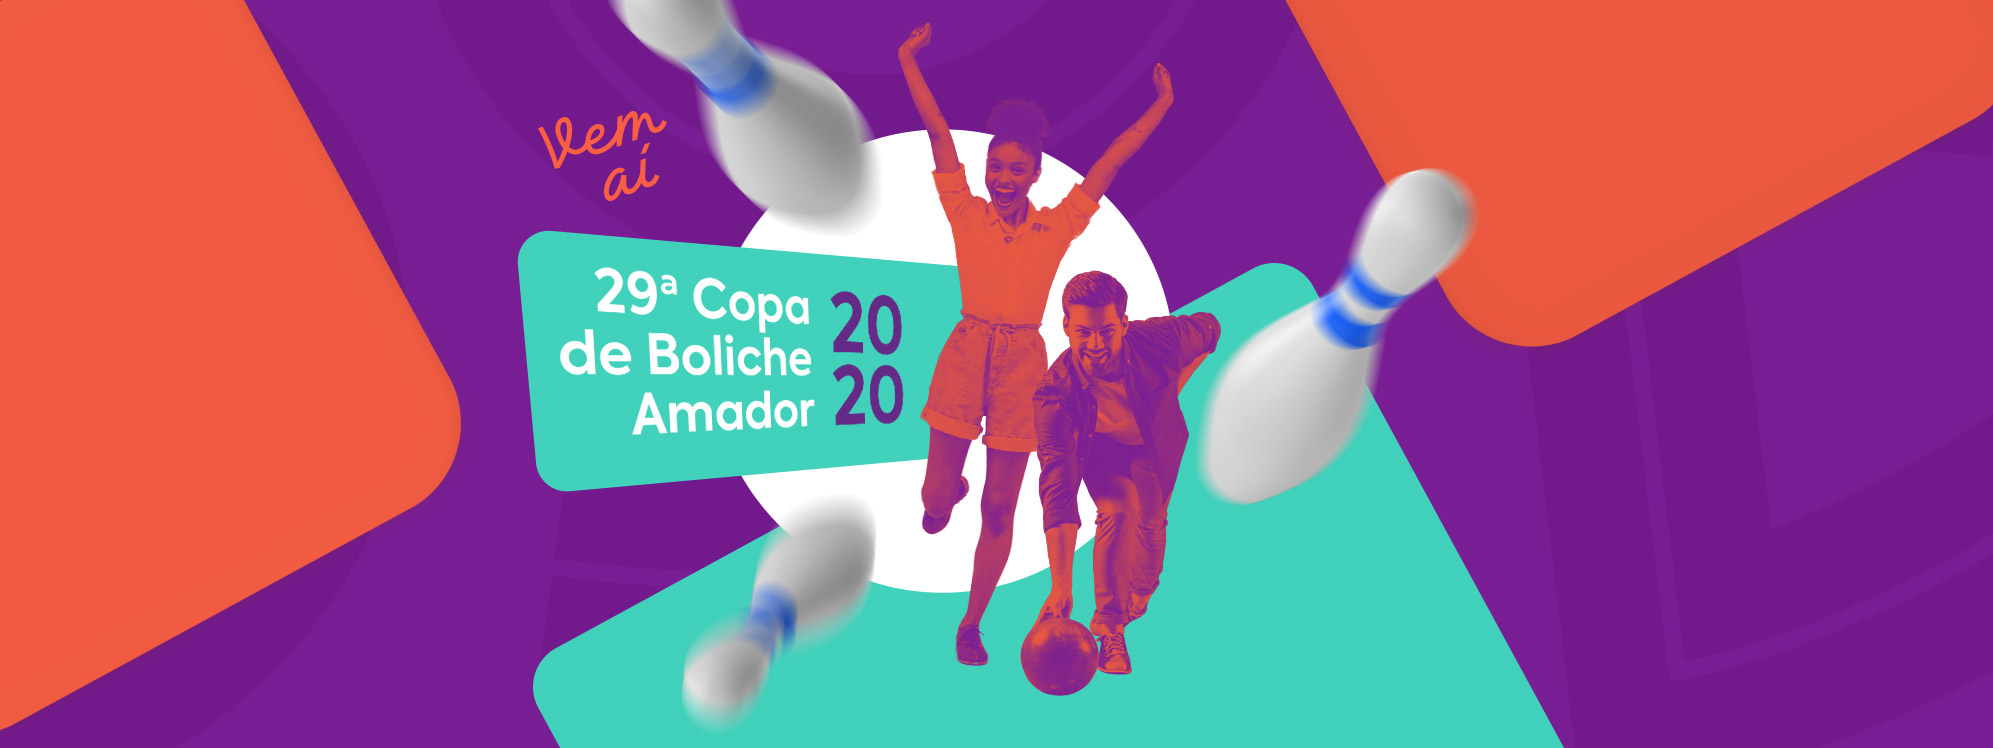 29ª Copa de Boliche Amador 2020 - Fase classificatória